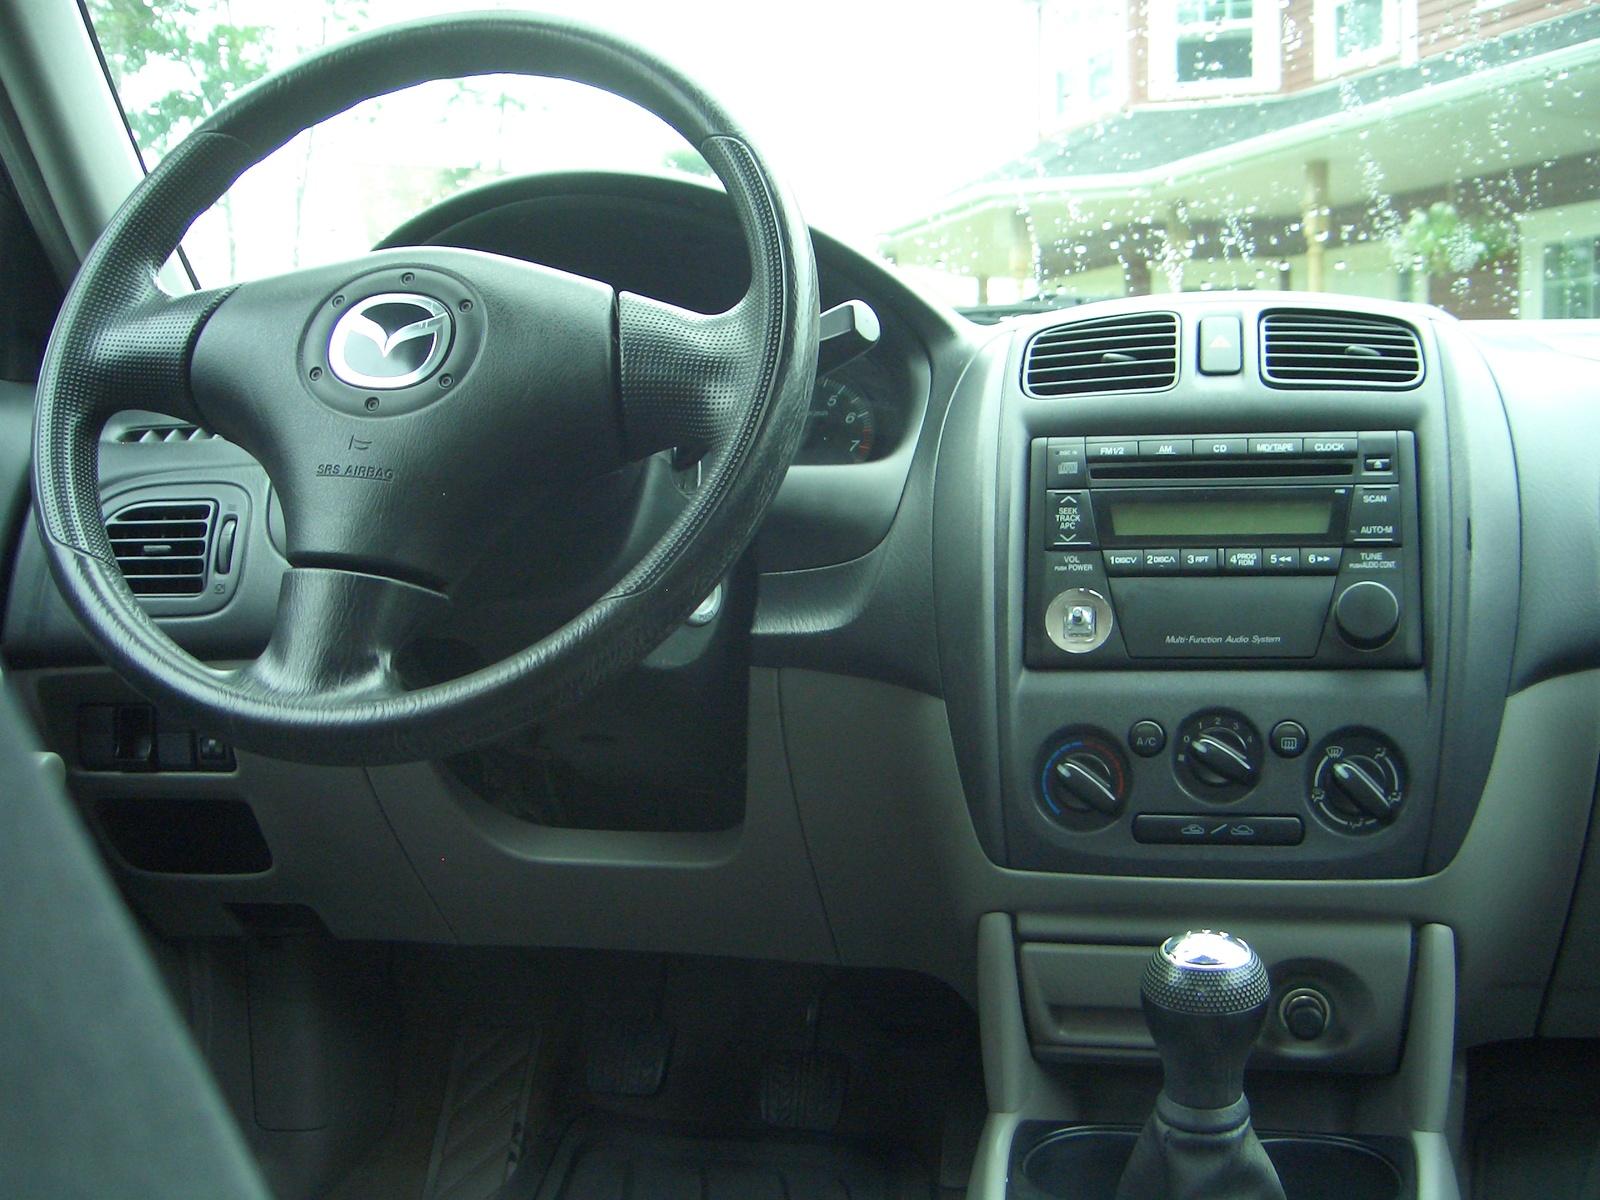 Mazda 3 2003 Interior